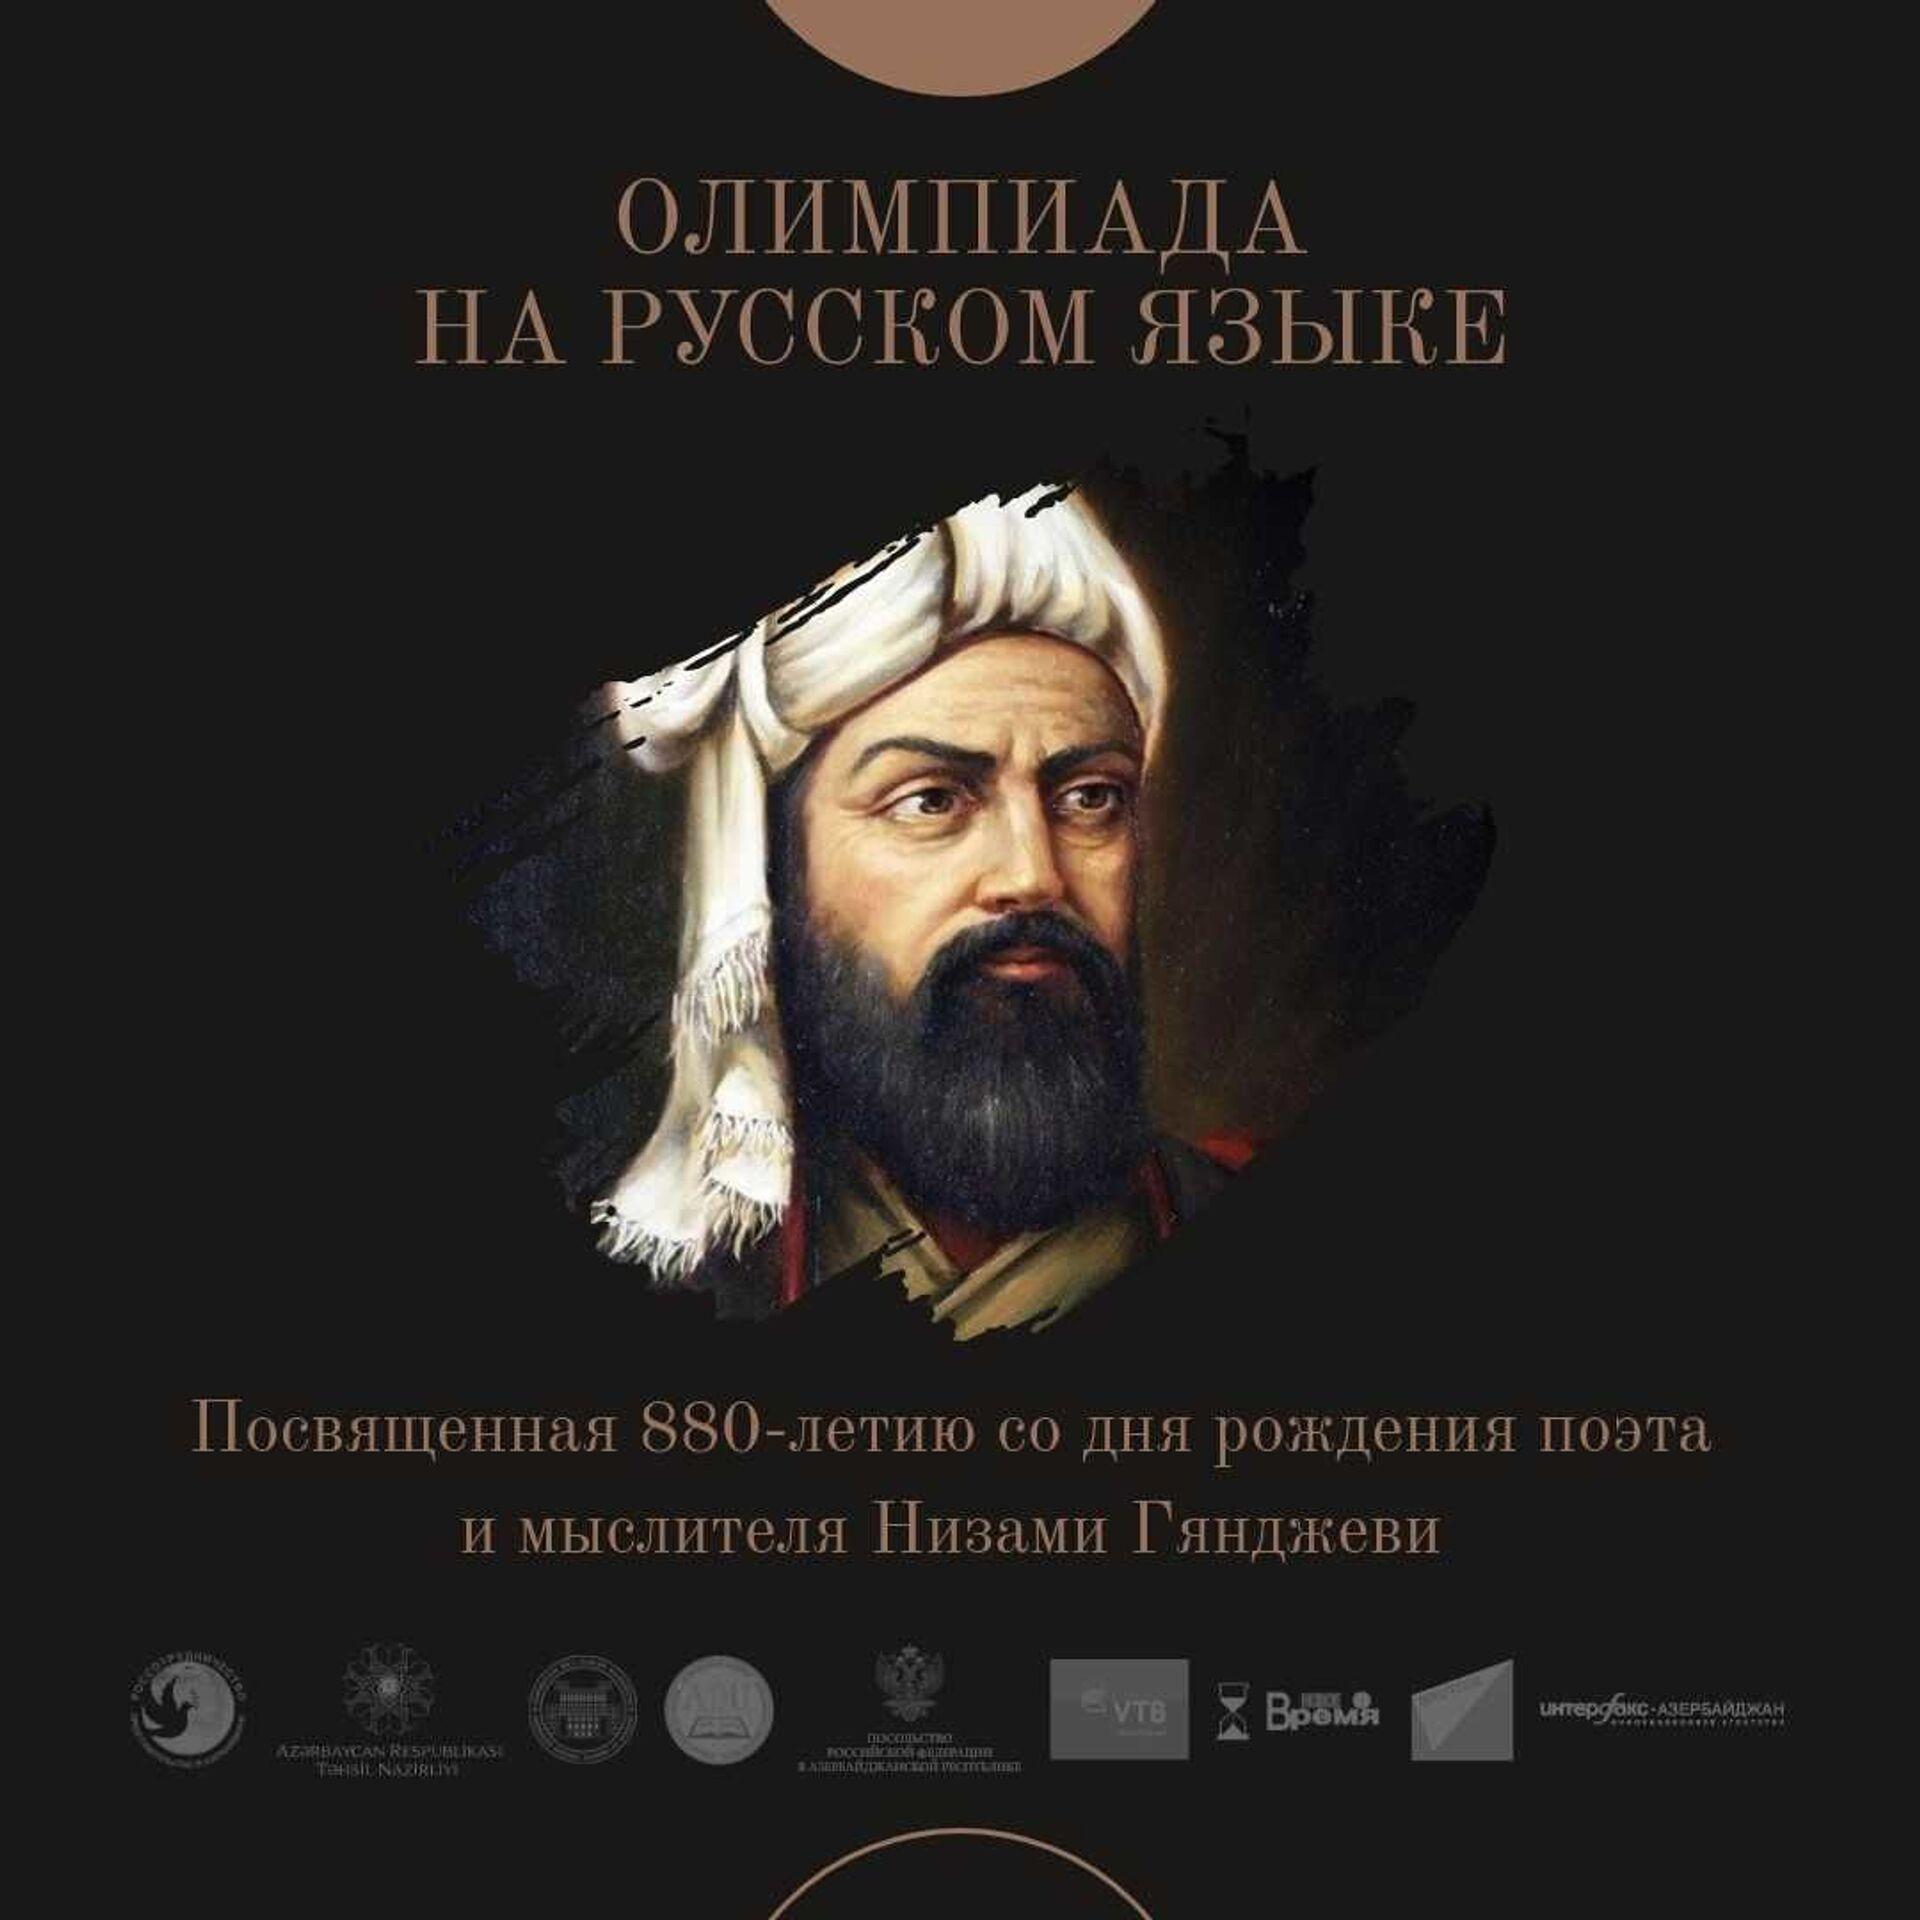 В Азербайджане проходит олимпиада, посвященная юбилею Низами Гянджеви - Sputnik Азербайджан, 1920, 07.05.2021